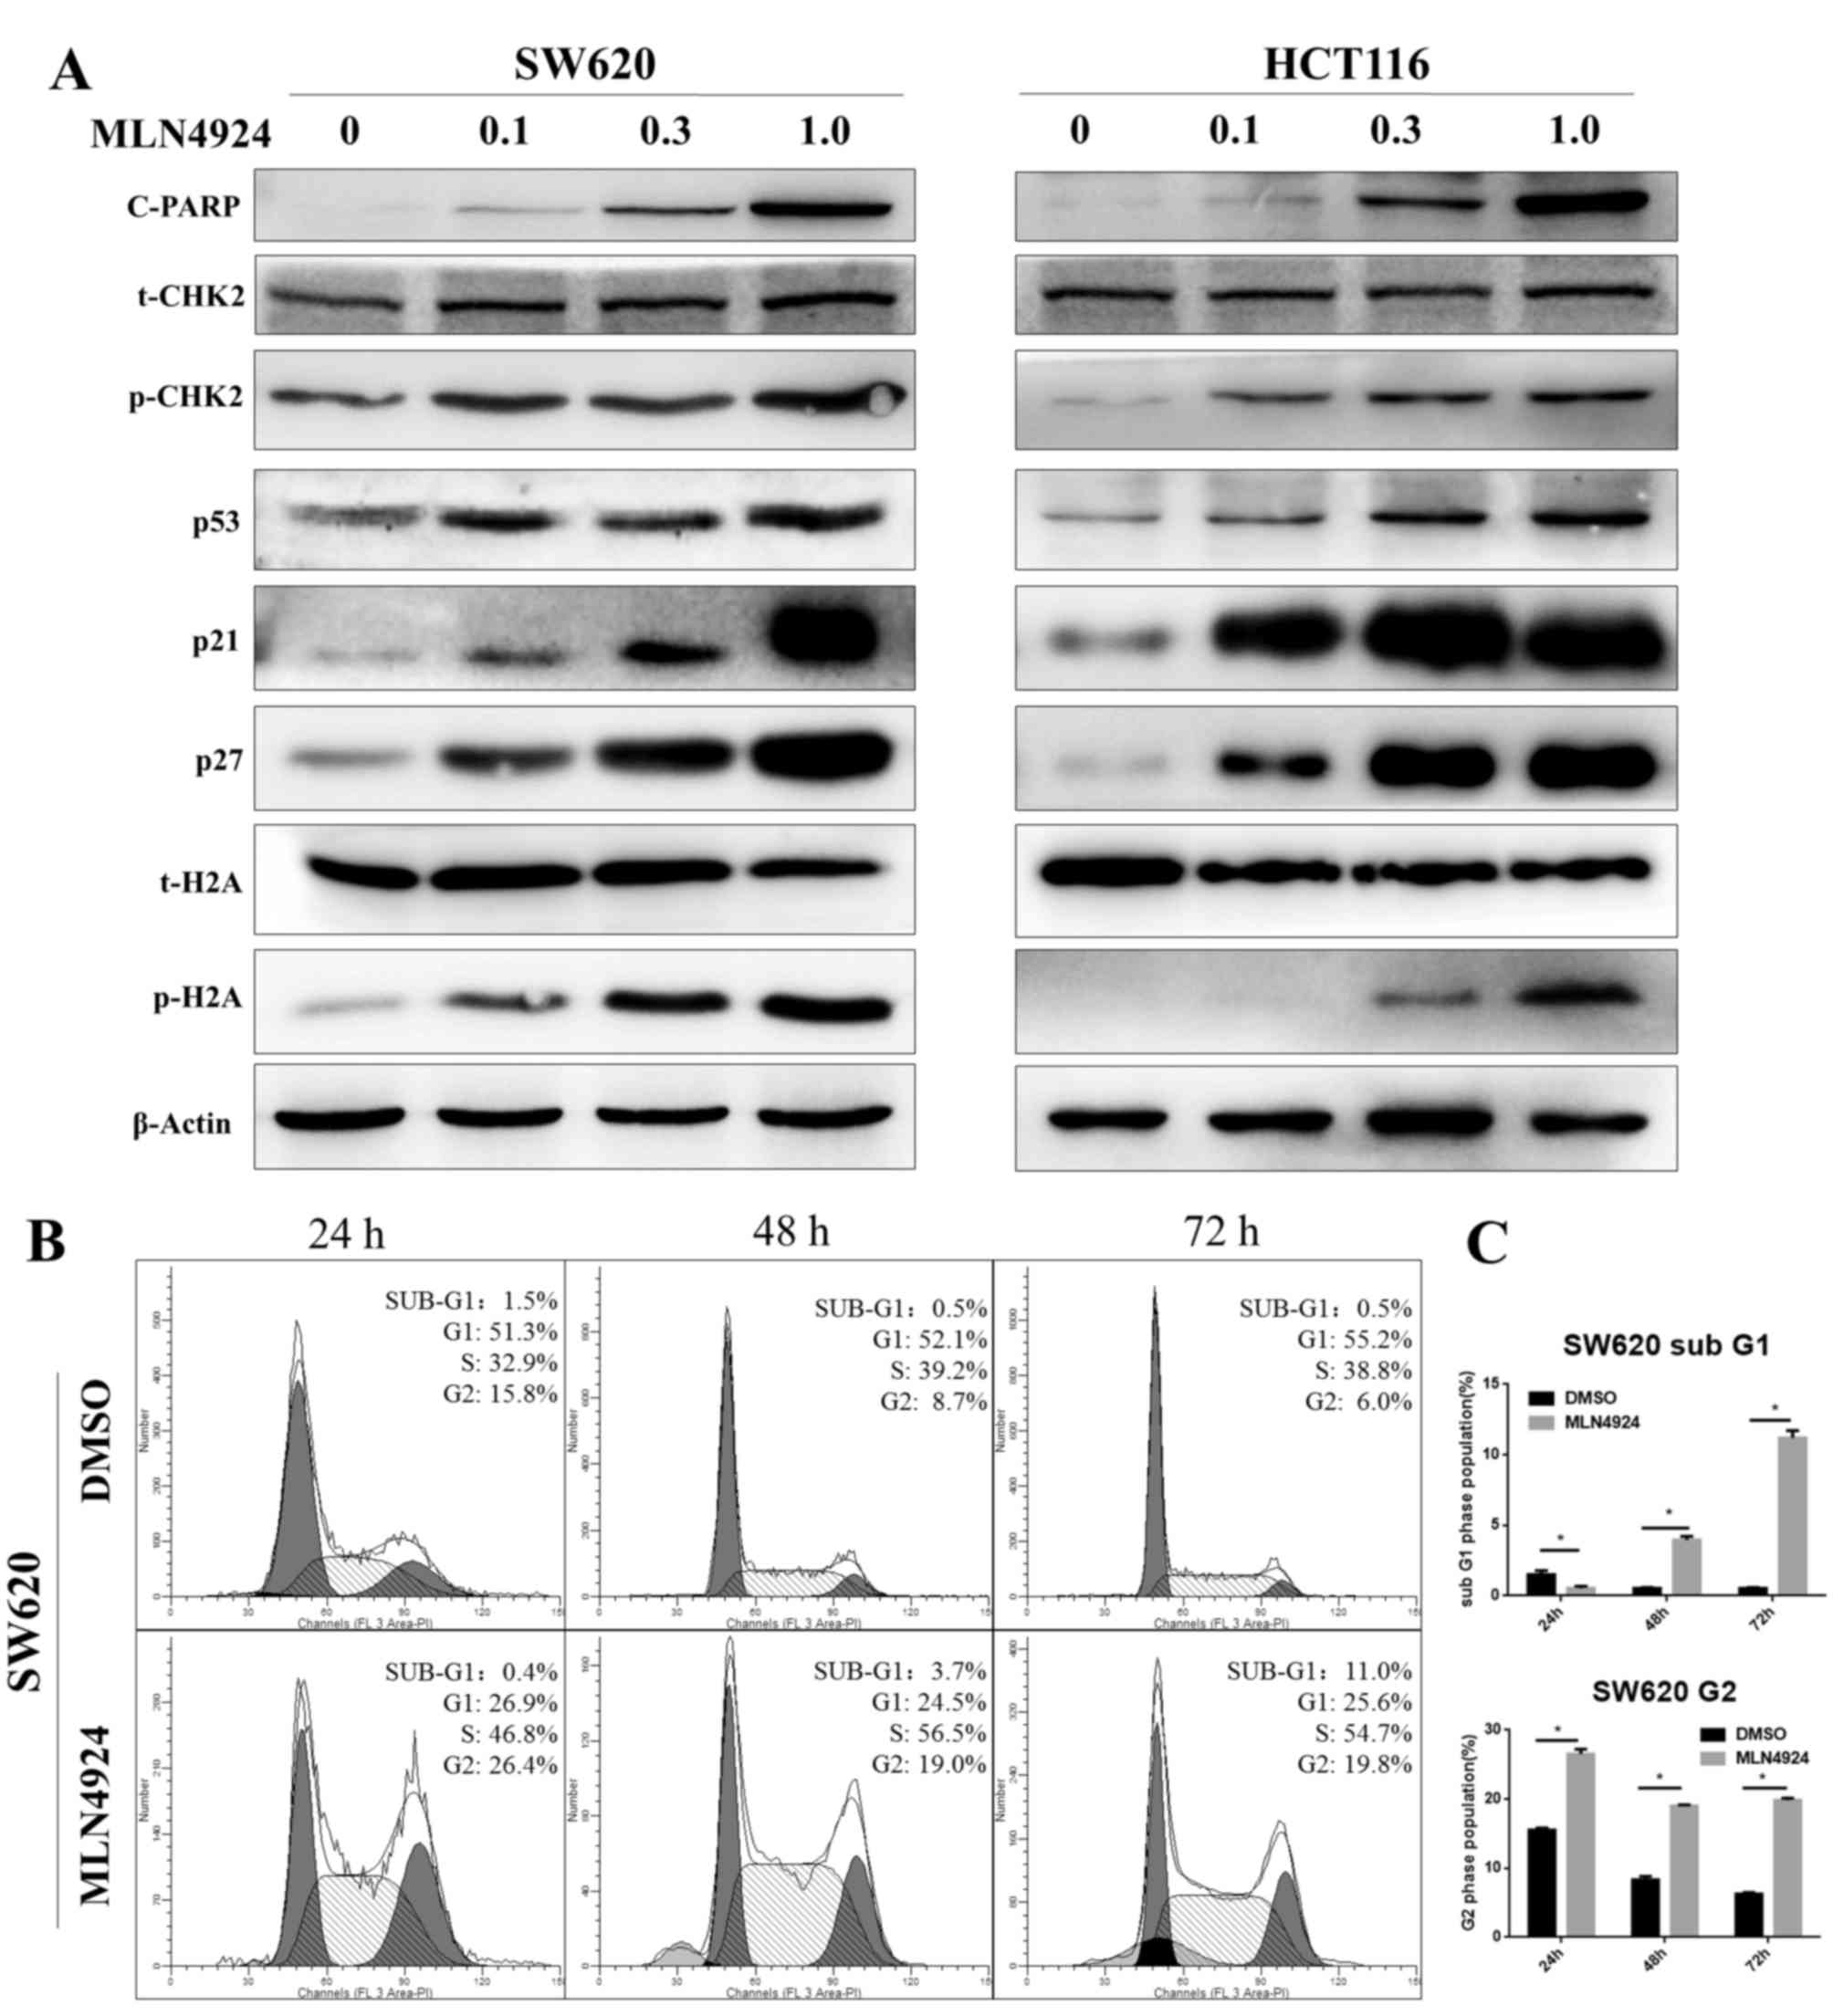 Neural precursor cell expressed, developmentally